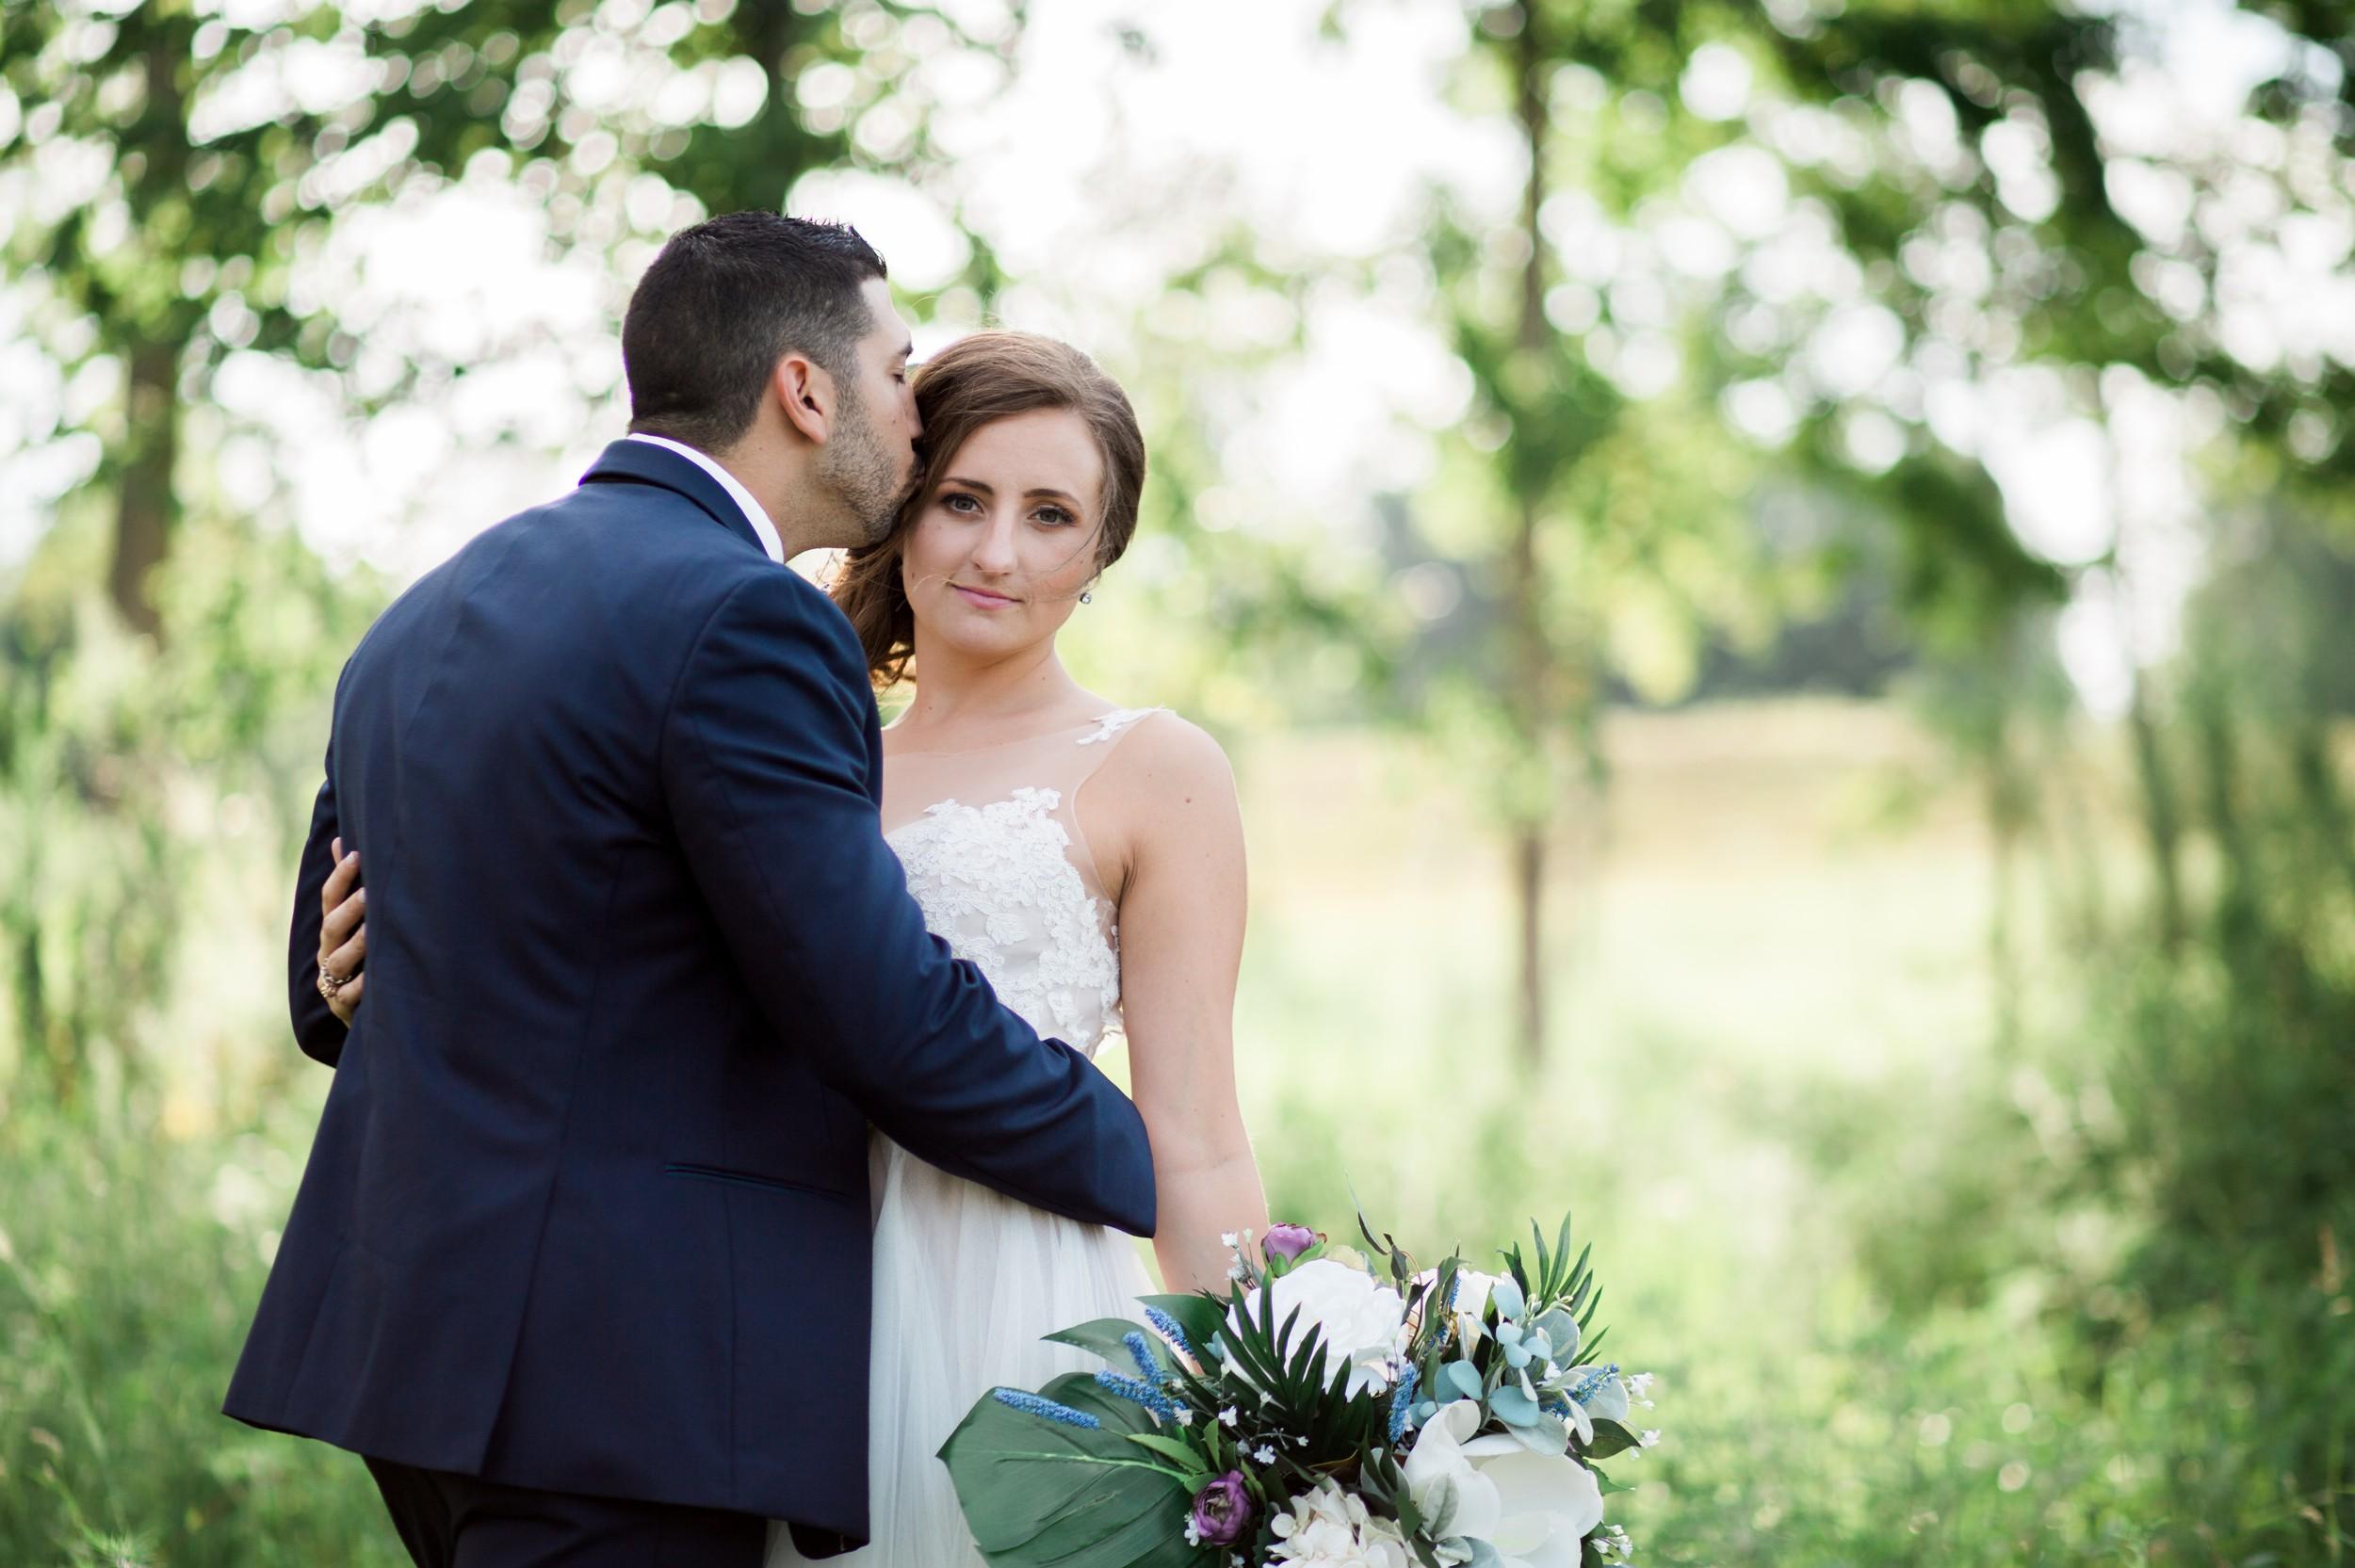 Nick-and-martina-pinelake-vinyards-wedding-columbiana-ohio-tracylynn-photography 14.jpg